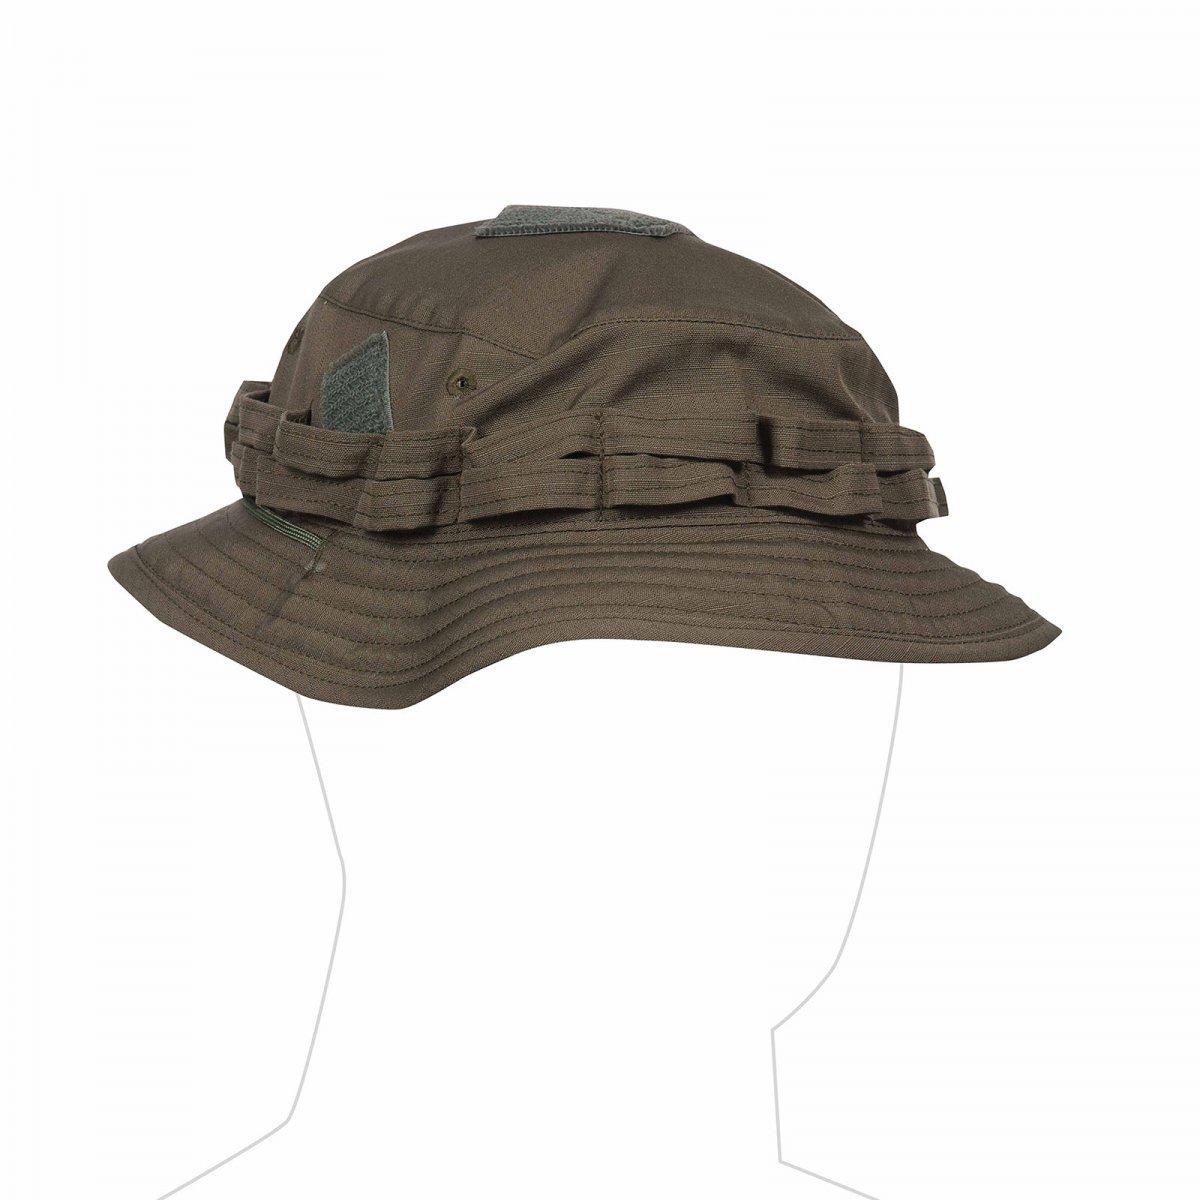 9a848fa78725c UF Pro Boonie hat - UF Pro - Brands